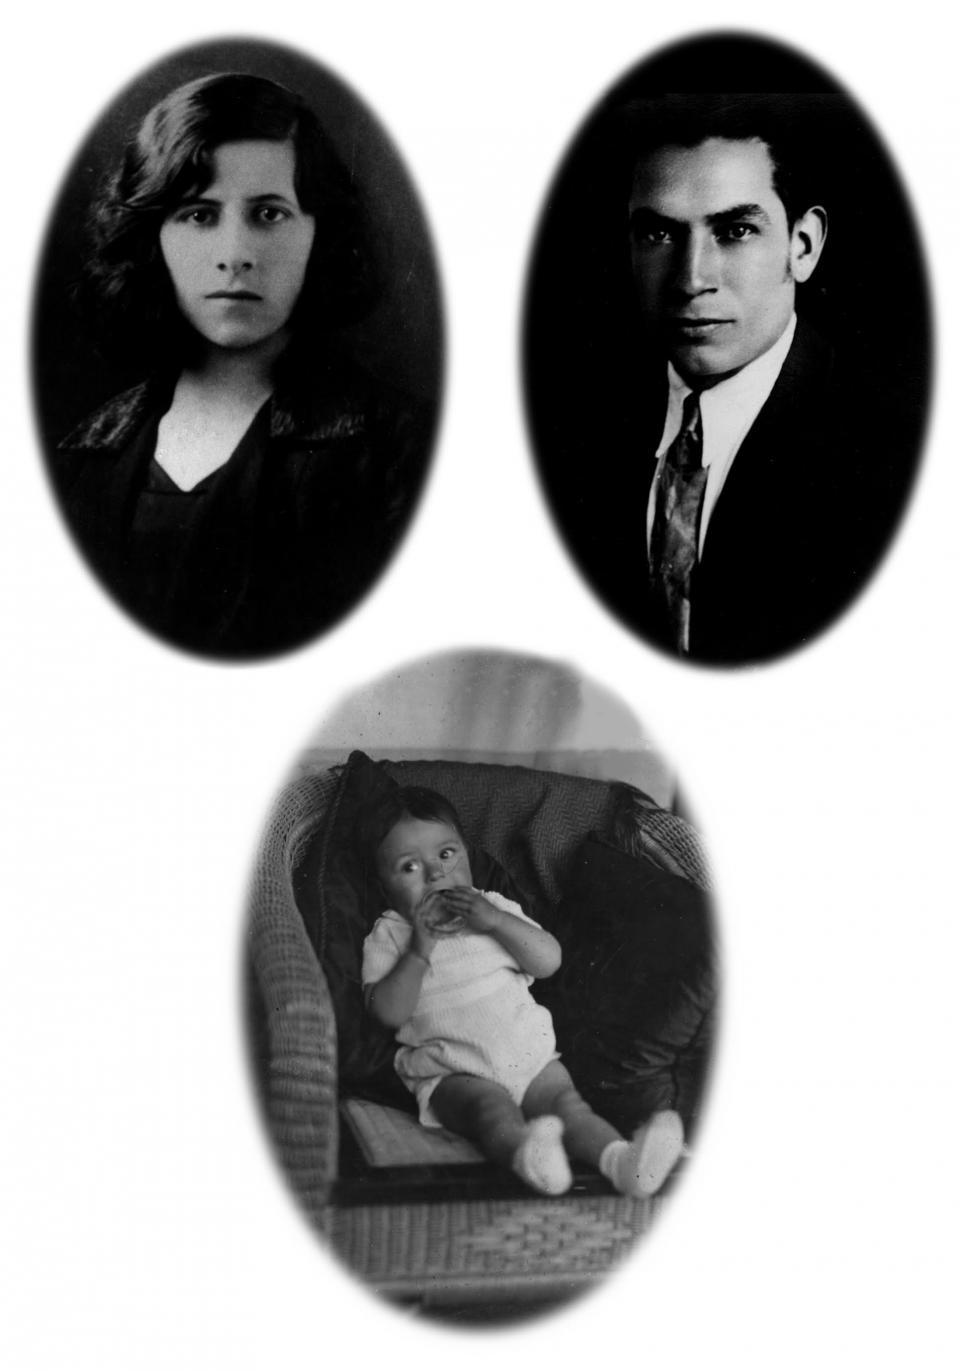 Luis Alfedo Arango y sus padres.